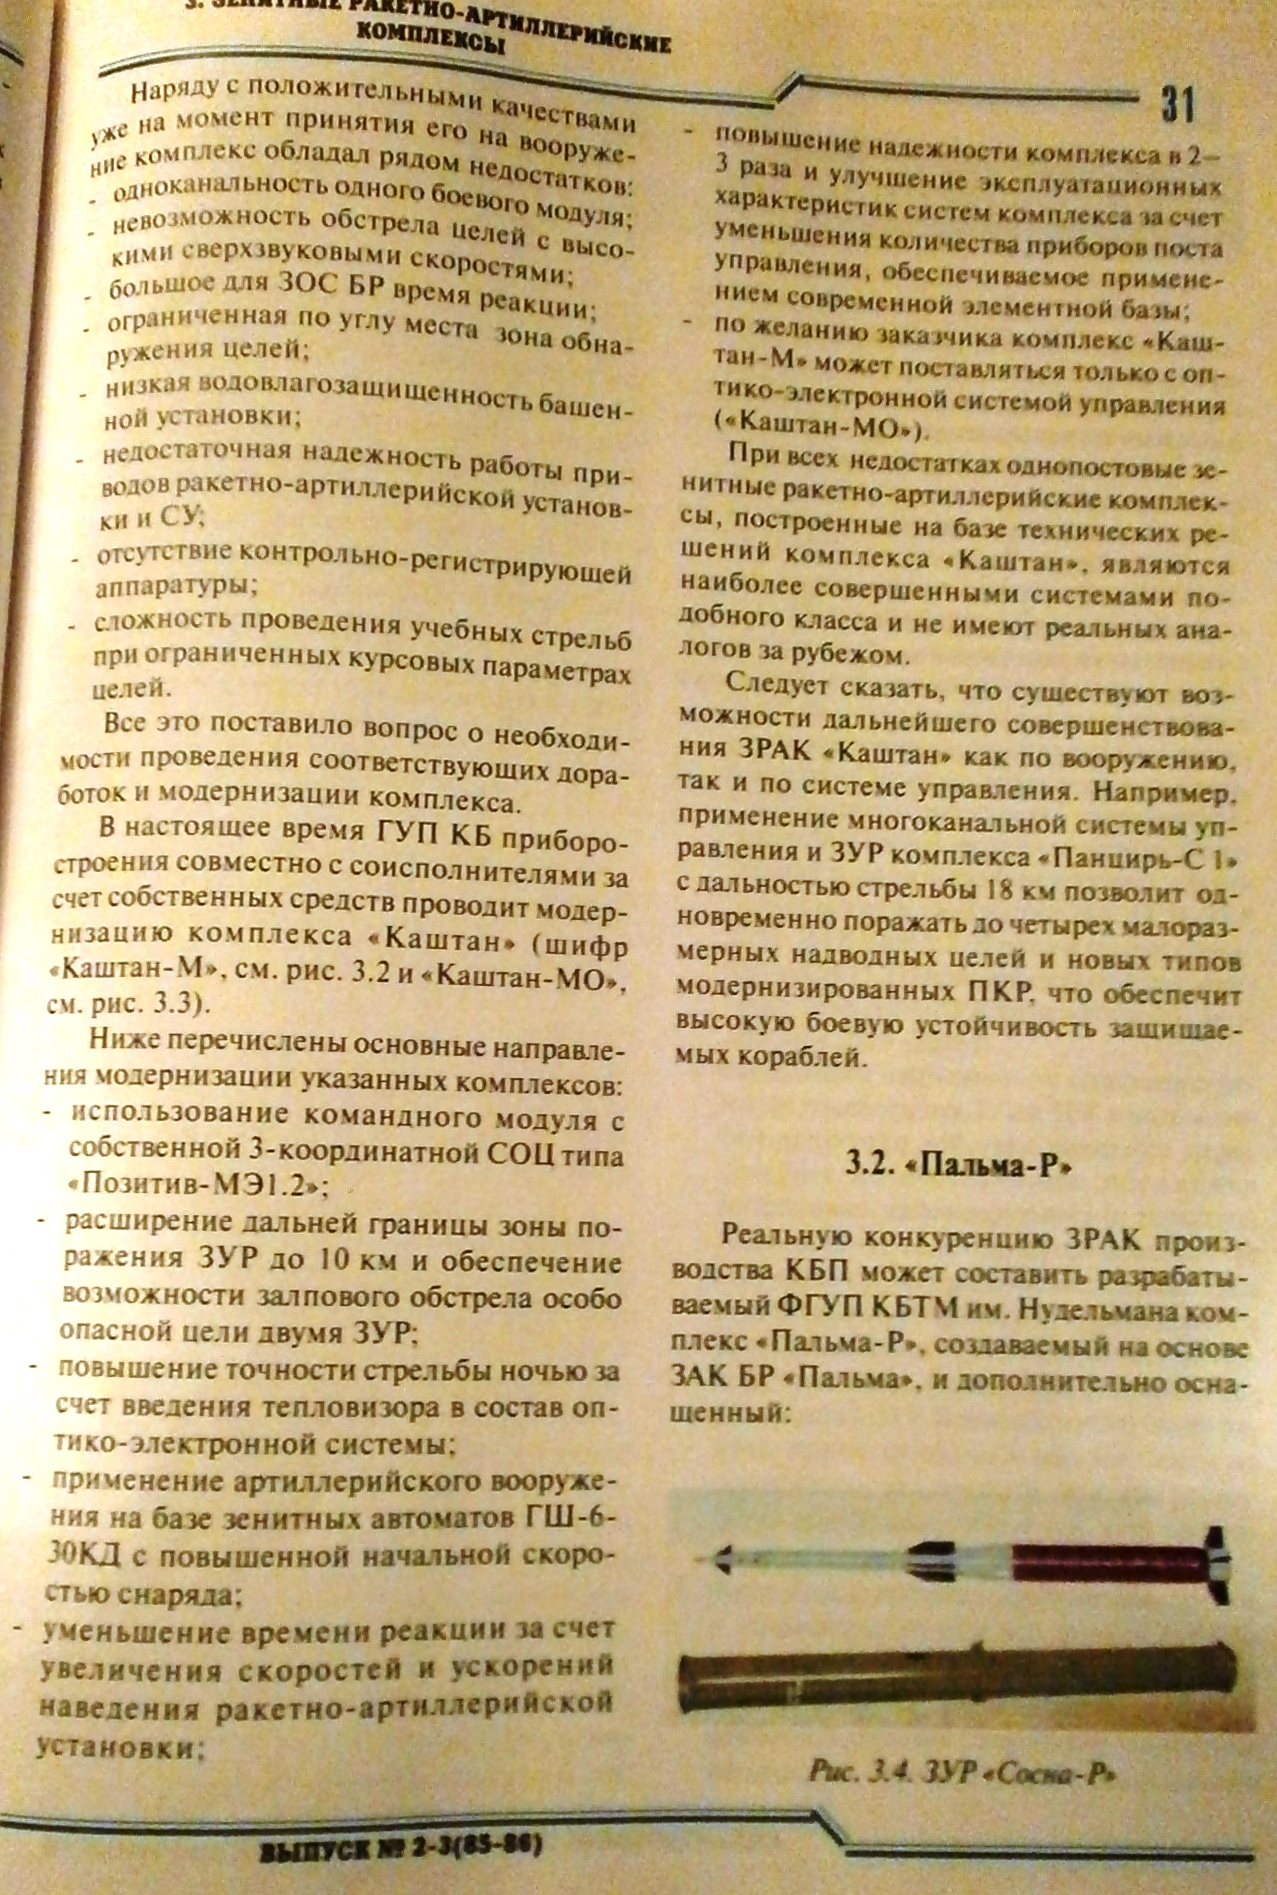 http://s5.uploads.ru/5BfLe.jpg